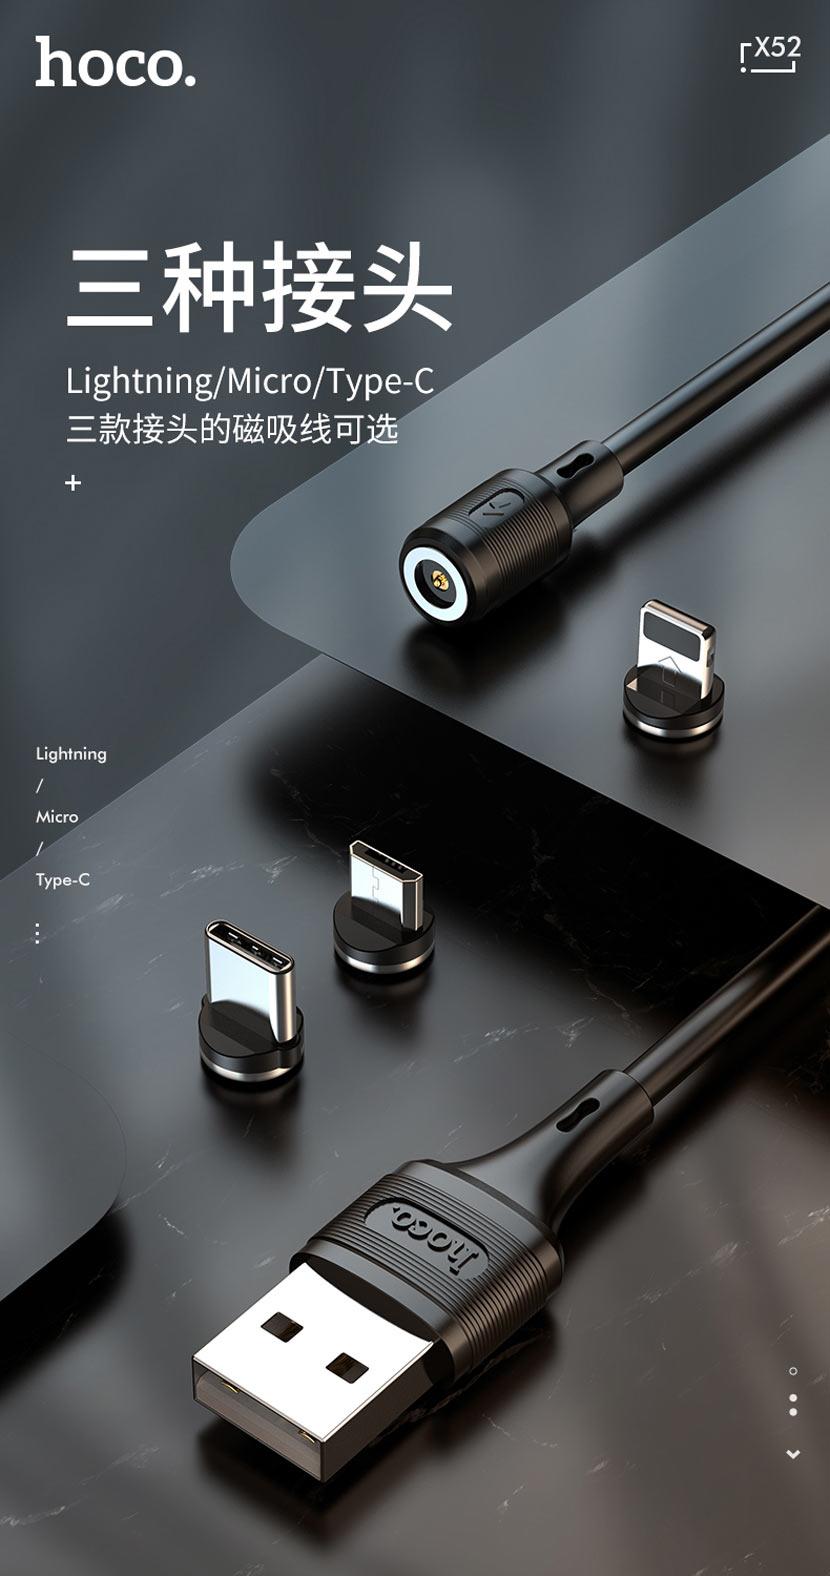 hoco news x52 sereno magnetic charging cable connectors cn